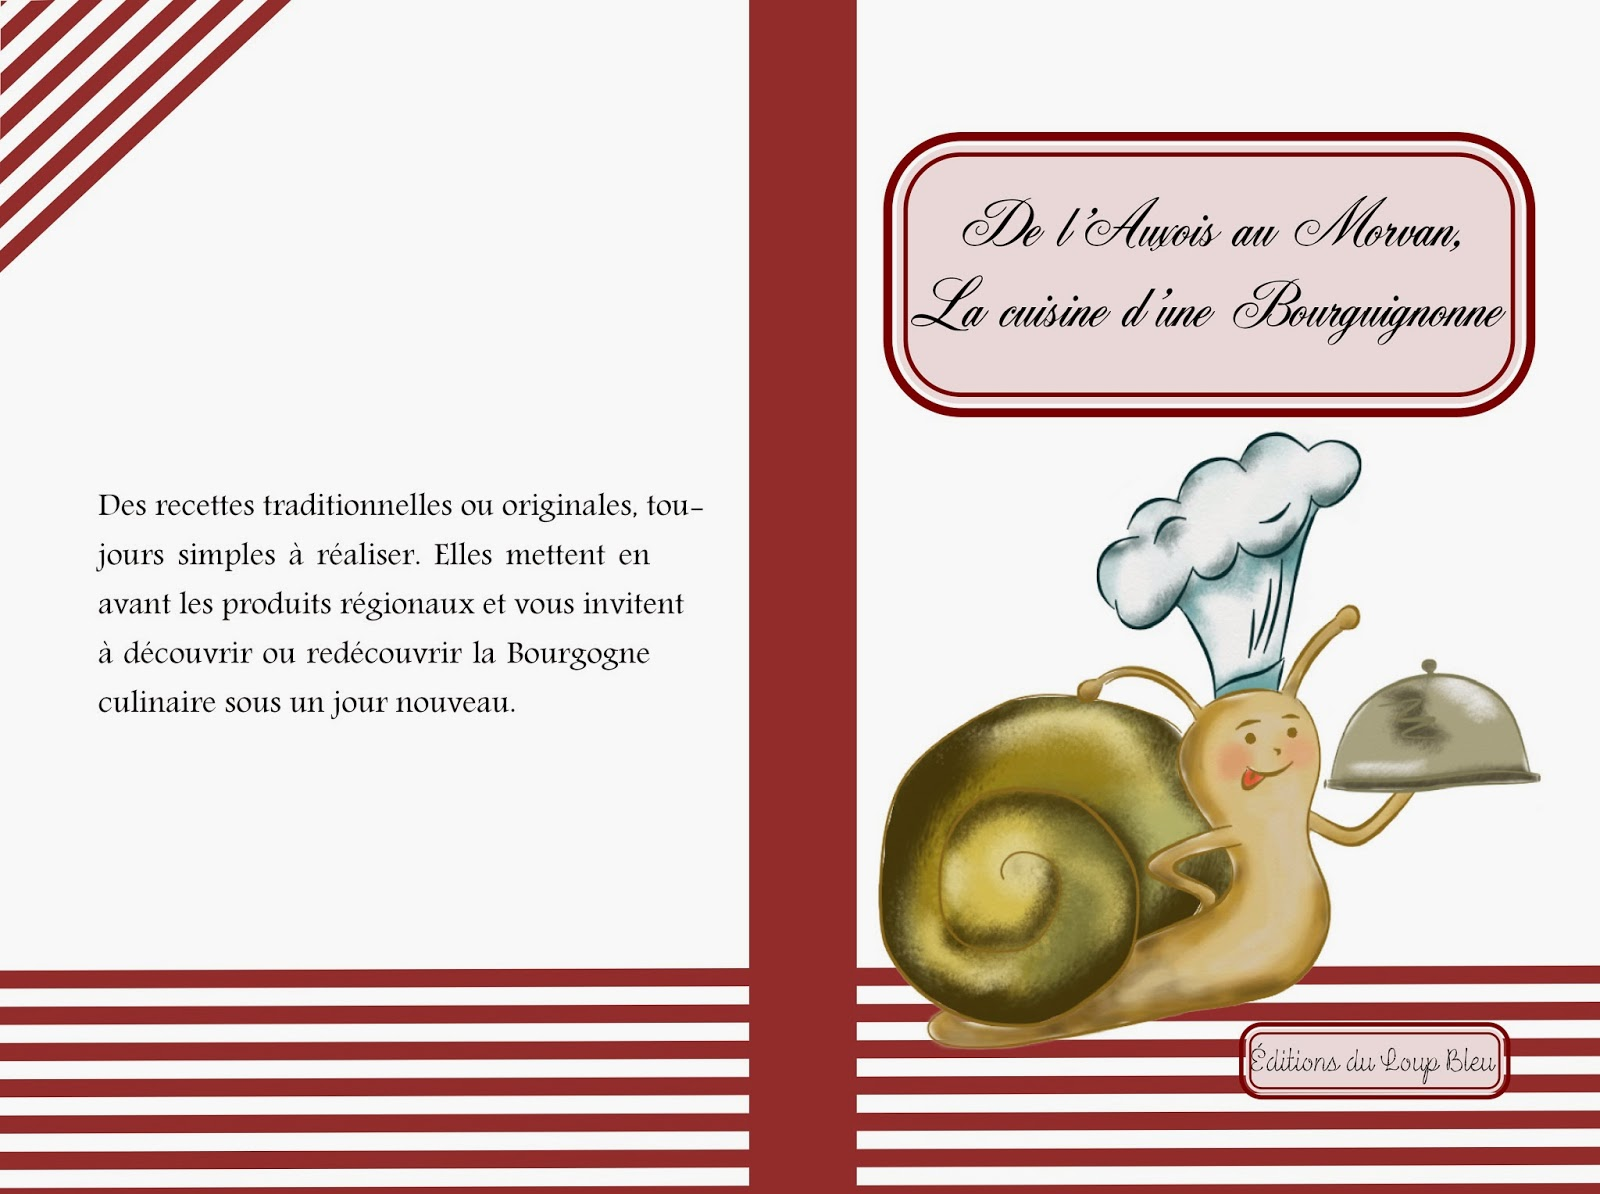 http://www.amazon.fr/lAuxois-Morvan-cuisine-dune-Bourguignonne/dp/B00K7ZSPTQ/ref=sr_1_1?ie=UTF8&qid=1404420832&sr=8-1&keywords=B00K7ZSPTQ